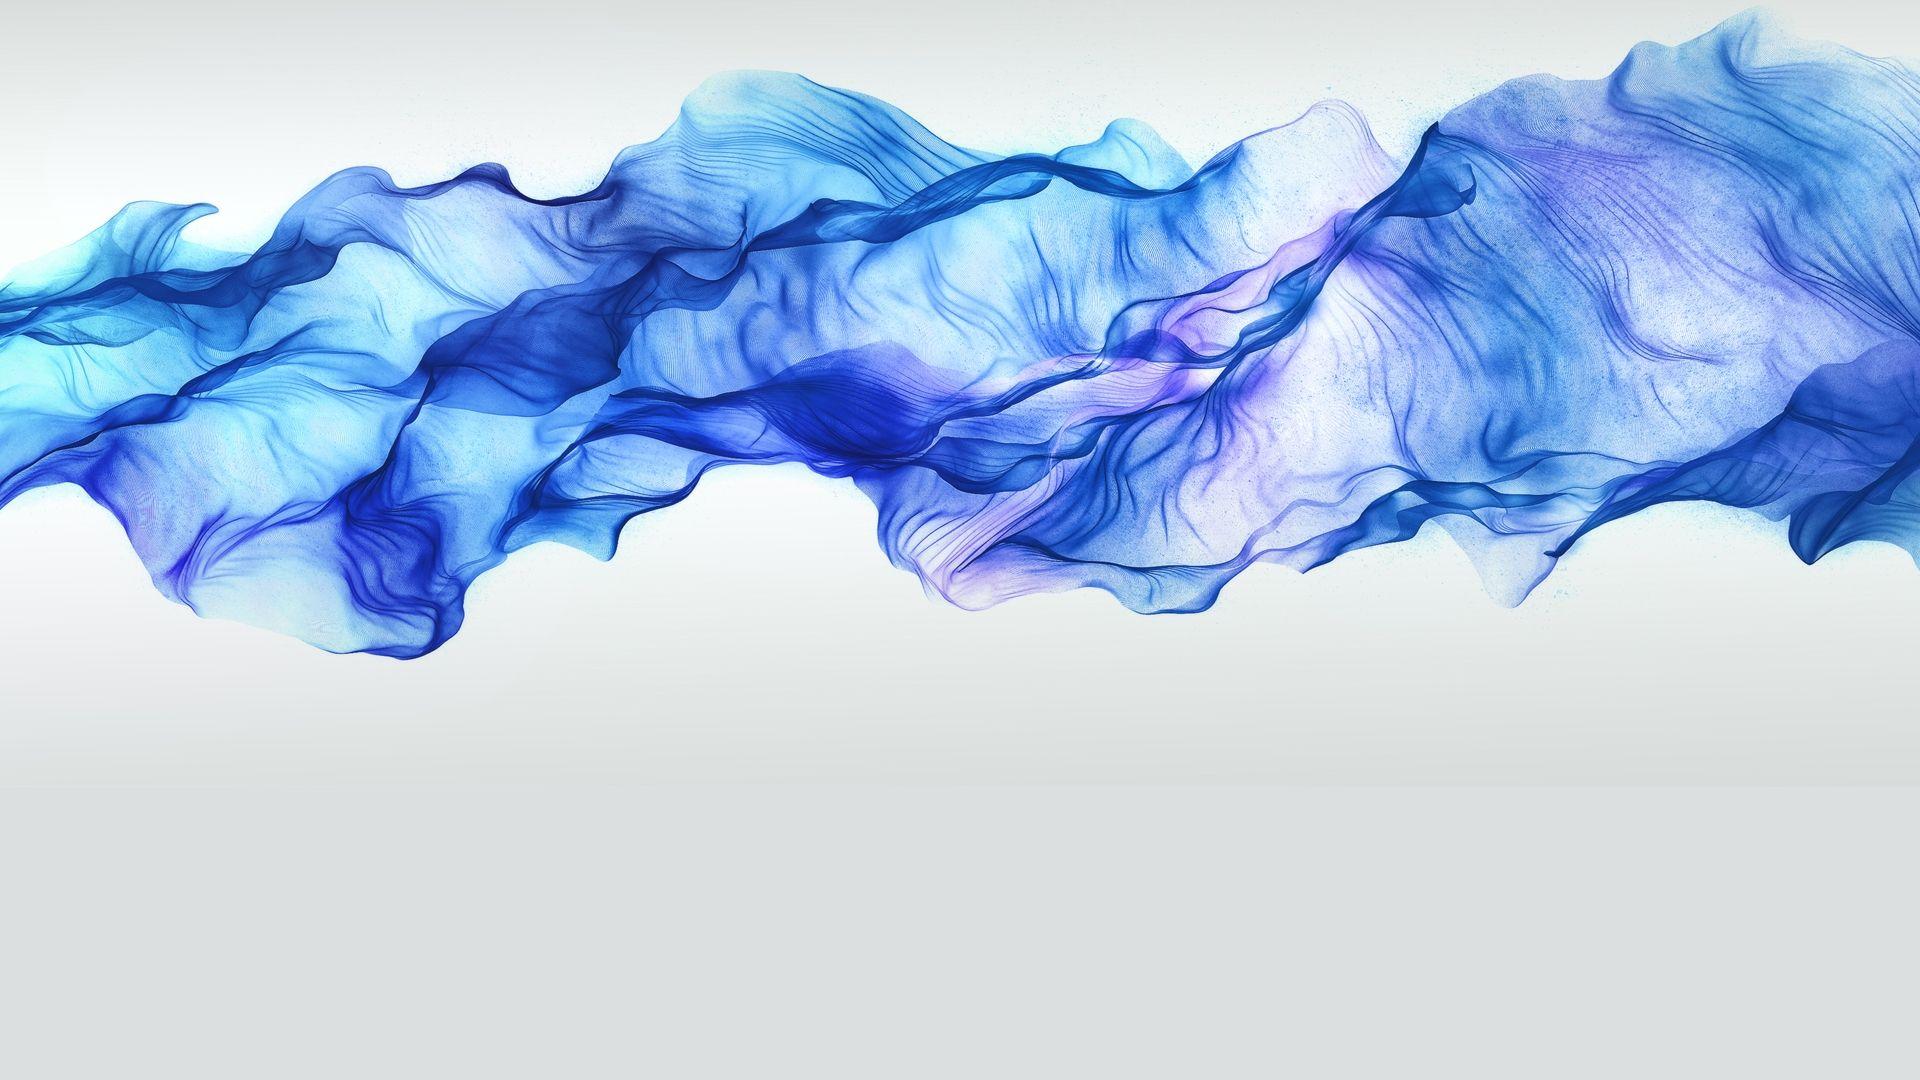 Blue Smoke White Background Wallpaper